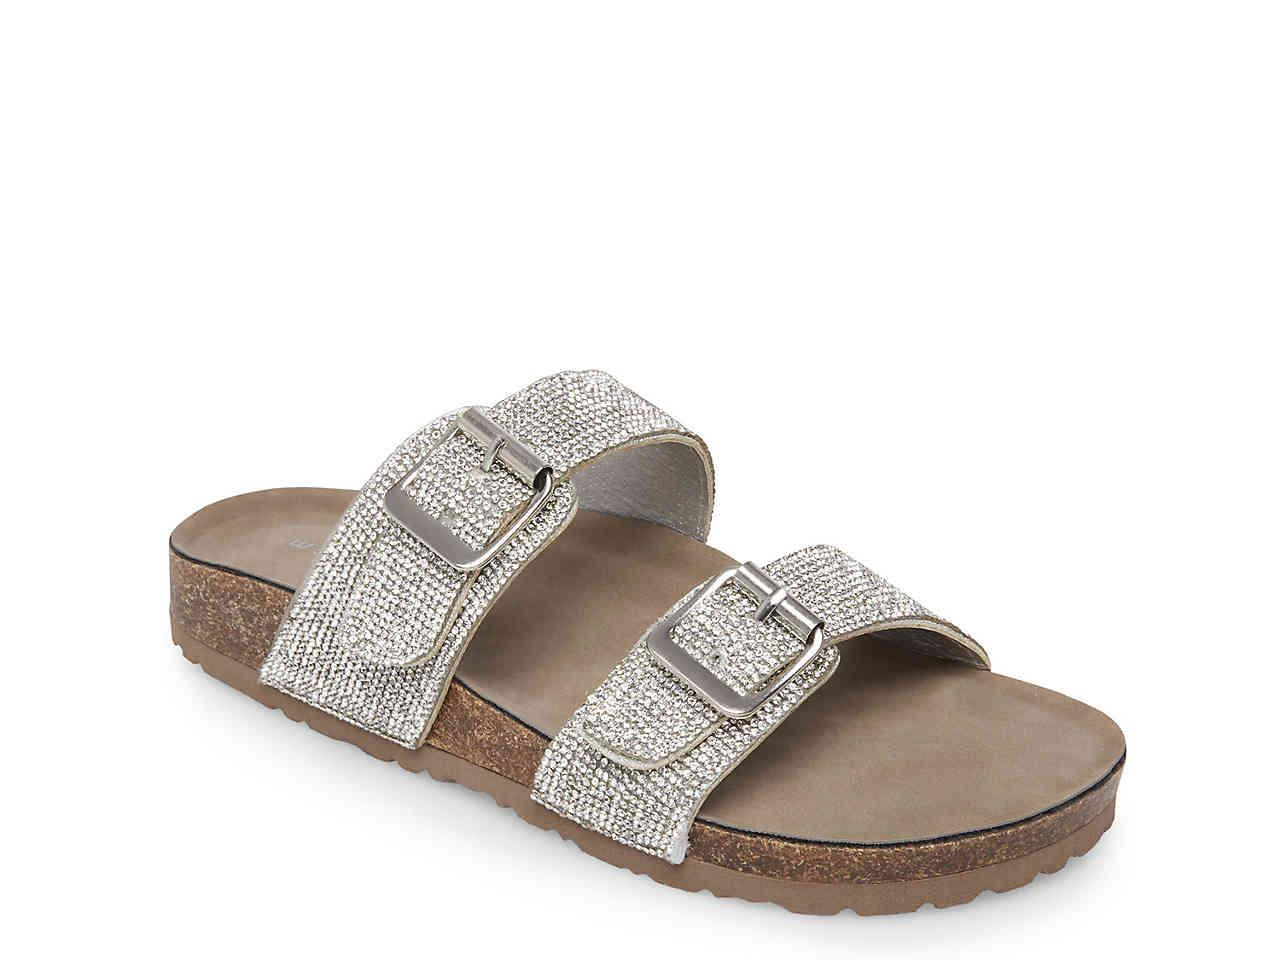 189dd2b8f8e7 Lyst - Madden Girl Brando Sandal in Metallic